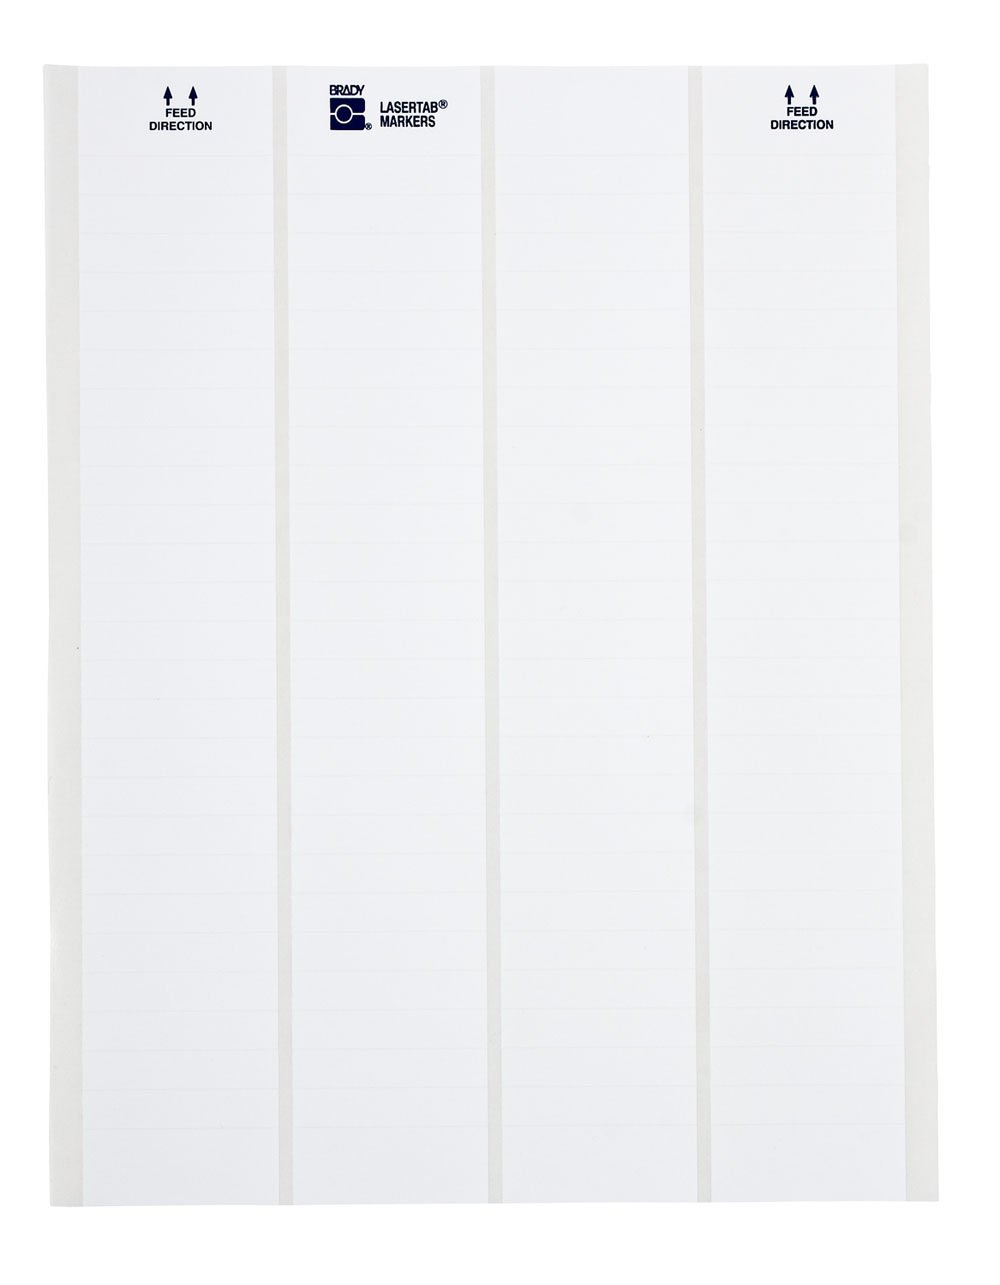 Brady LAT-21-707-1 2.5'' Width x 1'' Height, B-707 Rough Surface Polyester, Matte Finish White Lasertab Laser Printable Label (Pack of 1000)